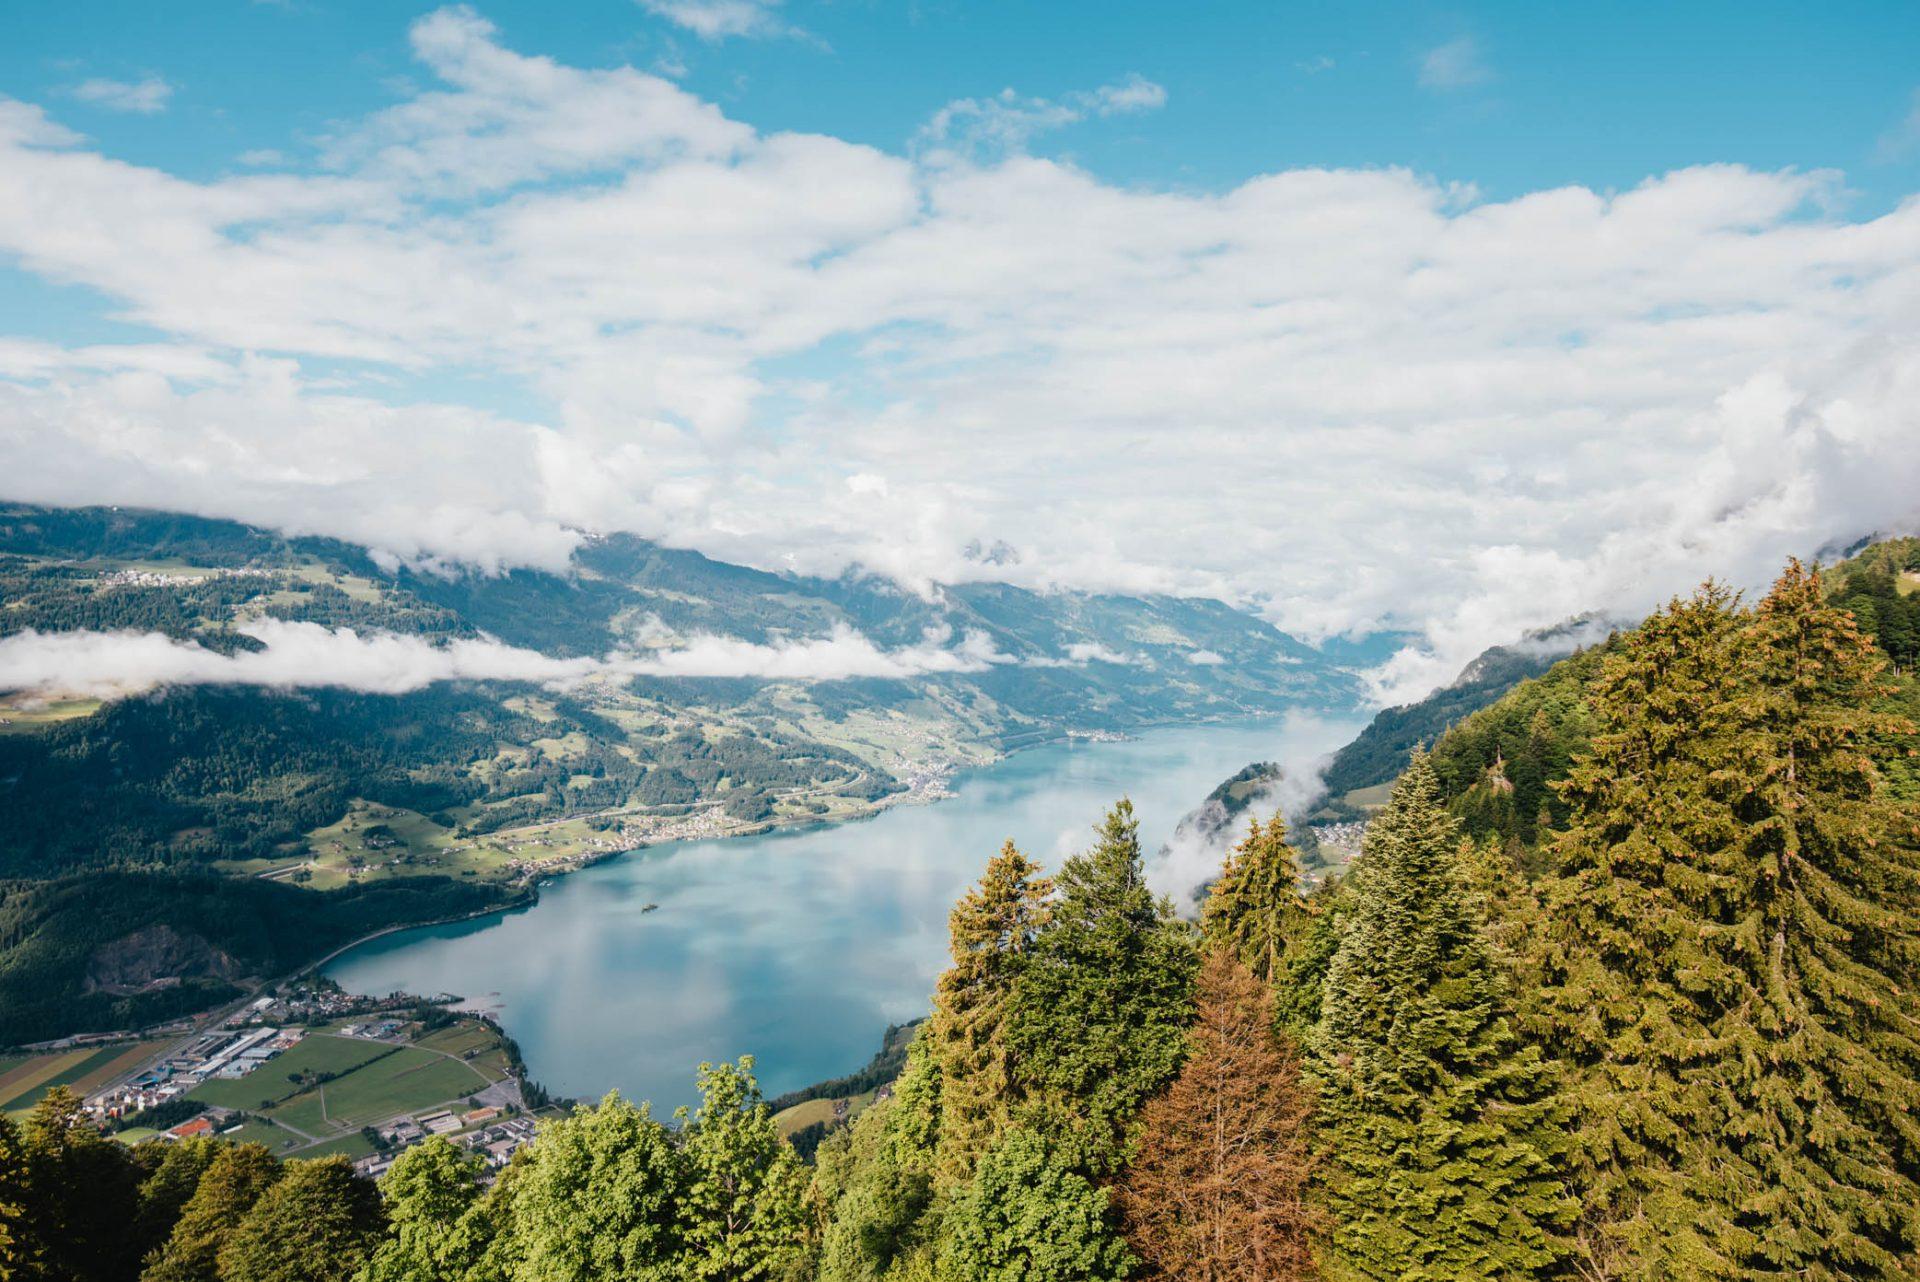 schweiz heidiland walensee wandern see walenstadt tschingla berge wolken tal bäume